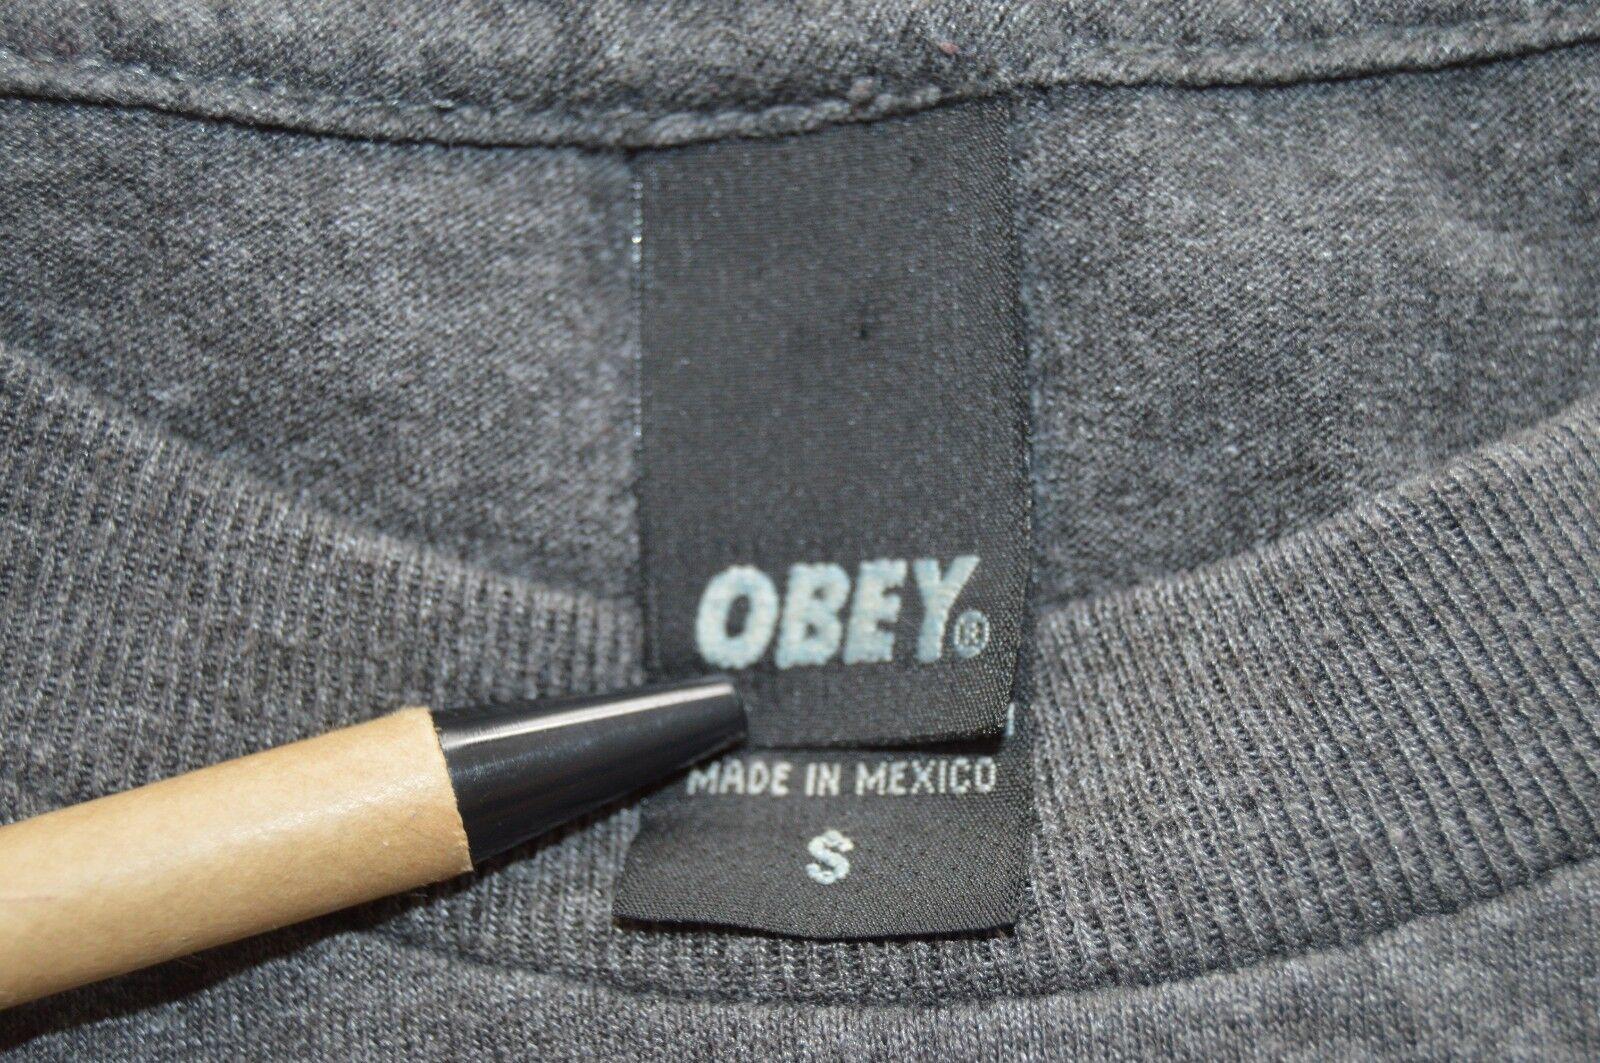 Obey Propaganda Engineering Five Hundred Twenty Pounds